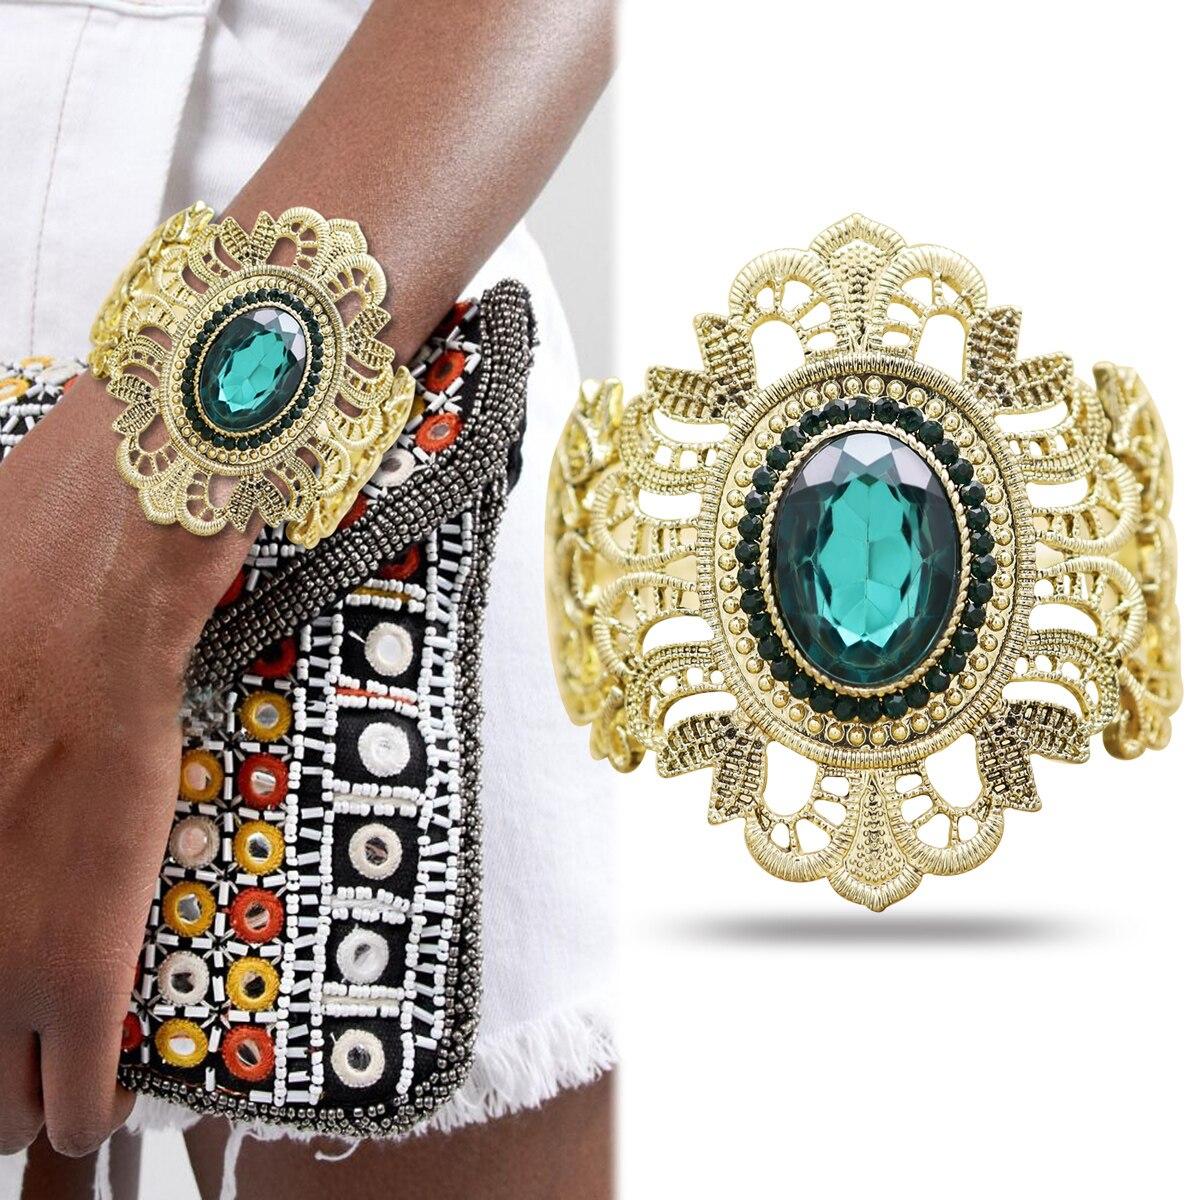 Las mujeres brazalete de pulsera de cristal pulsera joyería oro azul filigrana adornada de Metal con detalle de encaje de moda Pulseira femenina